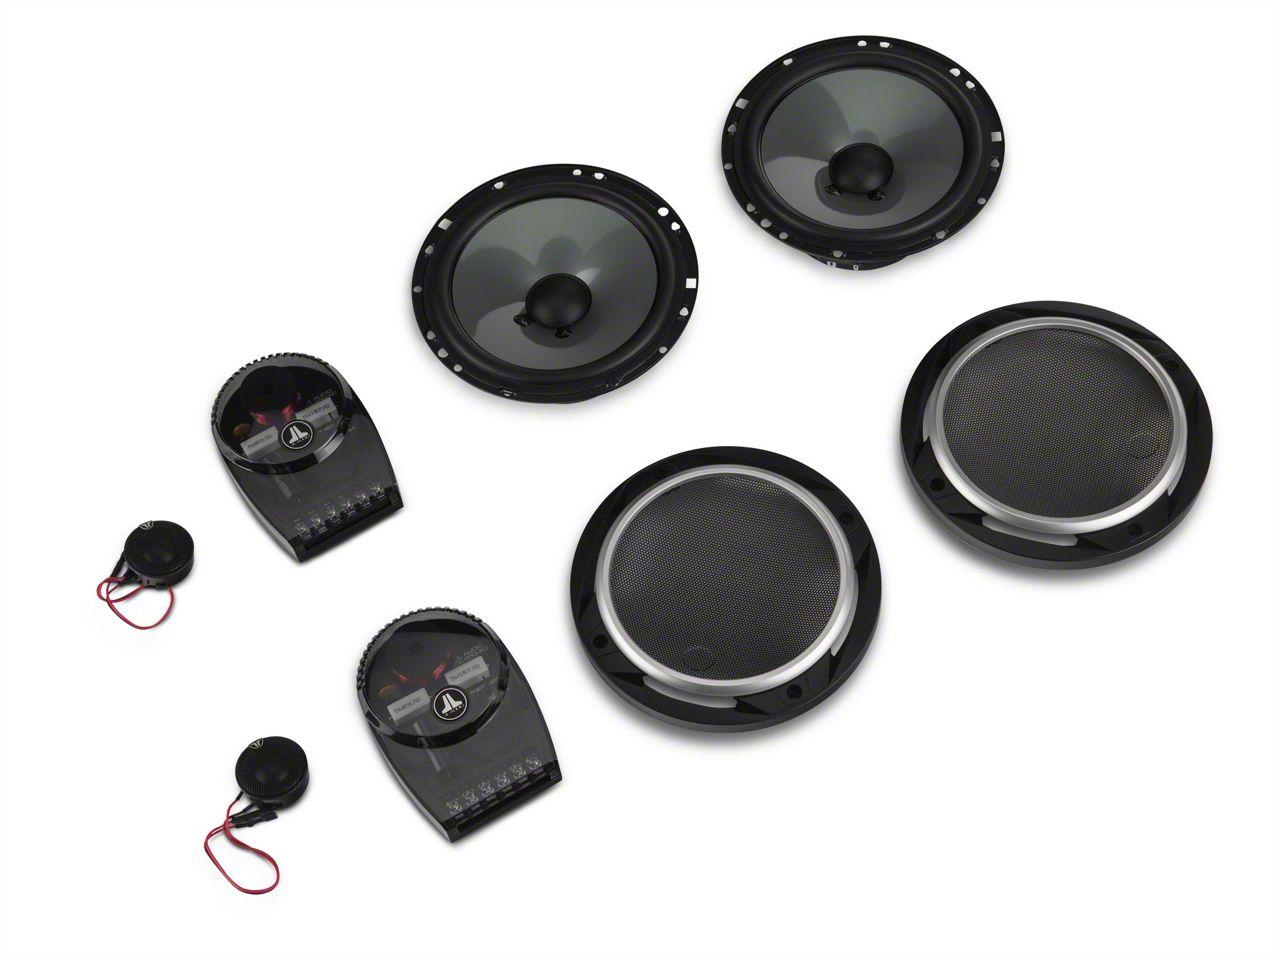 JL Audio 6.5 in. 2-Way Component Speaker System (87-18 Jeep Wrangler YJ, TJ & JK)